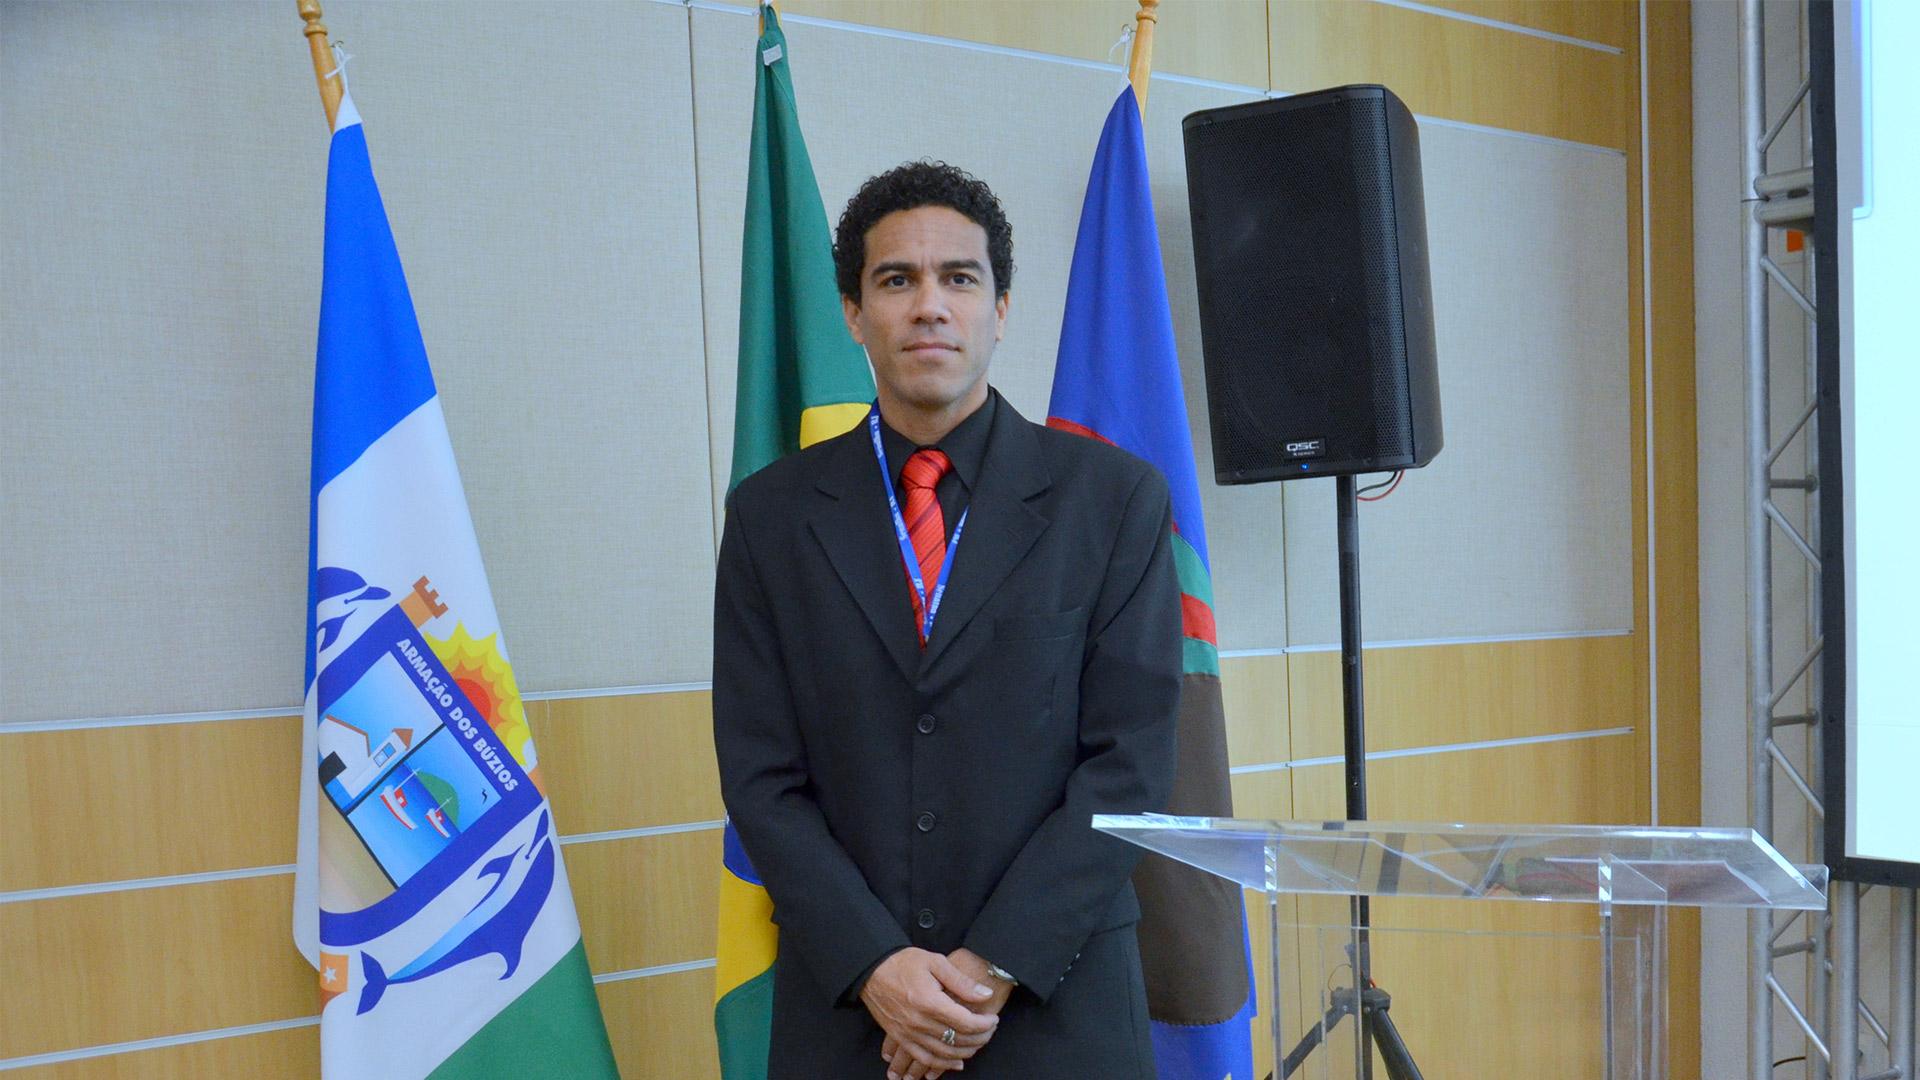 Mestre de Cerimônias Ed Rodrigues no Ferradura Resort